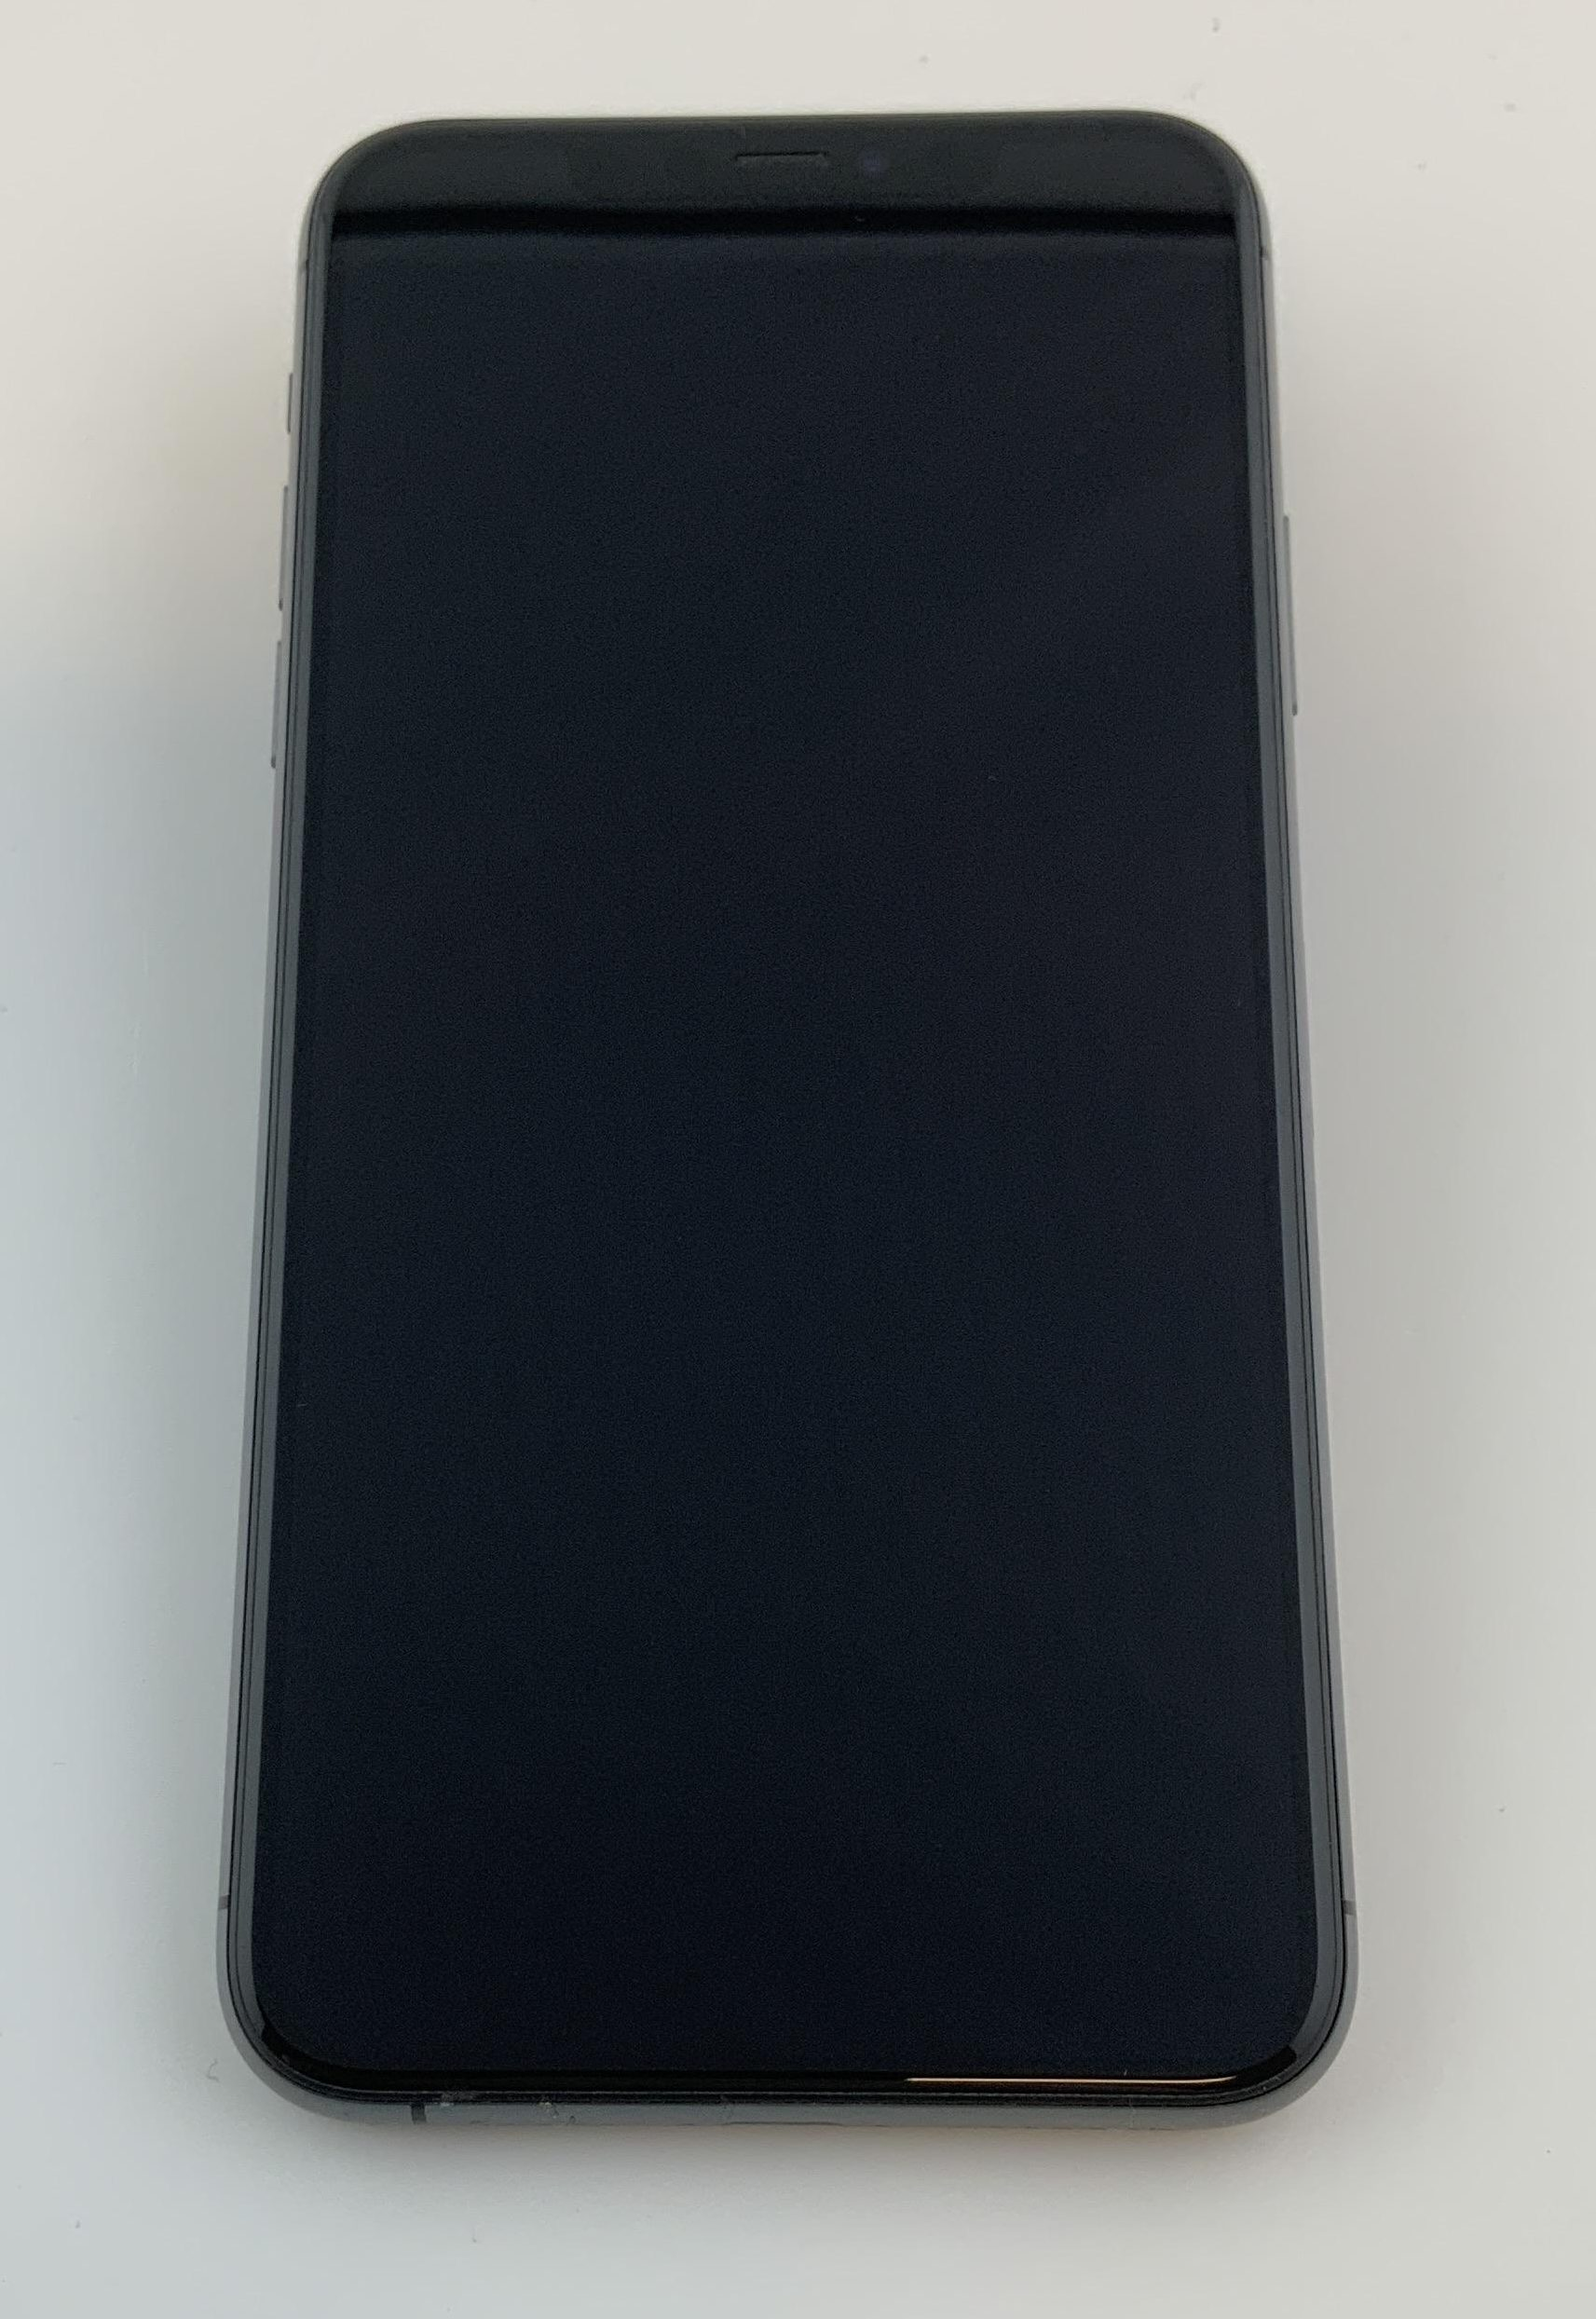 iPhone 11 Pro Max 256GB, 256GB, Space Gray, image 1